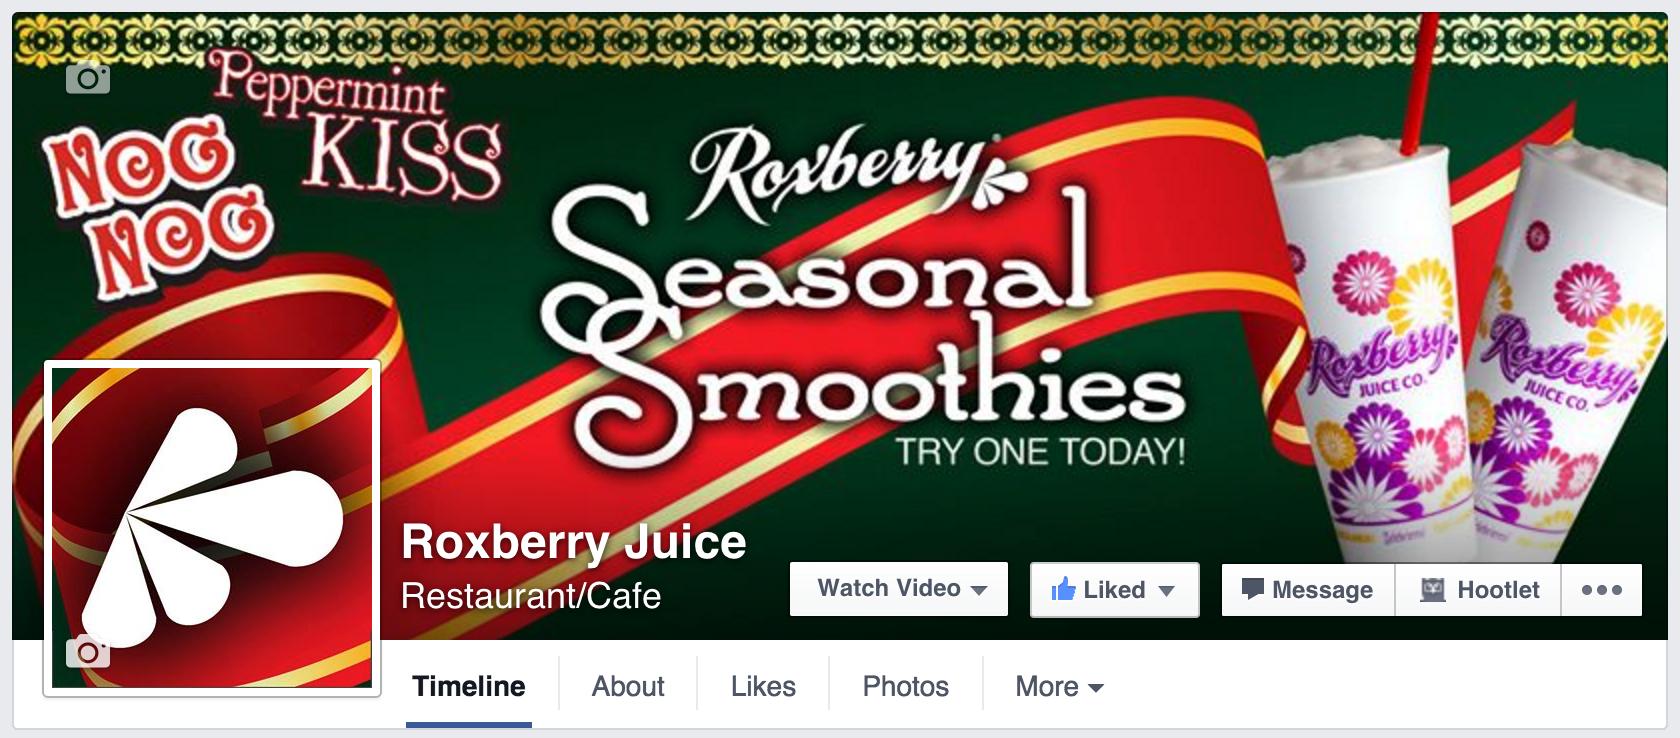 Roxberry Juice - Facebook